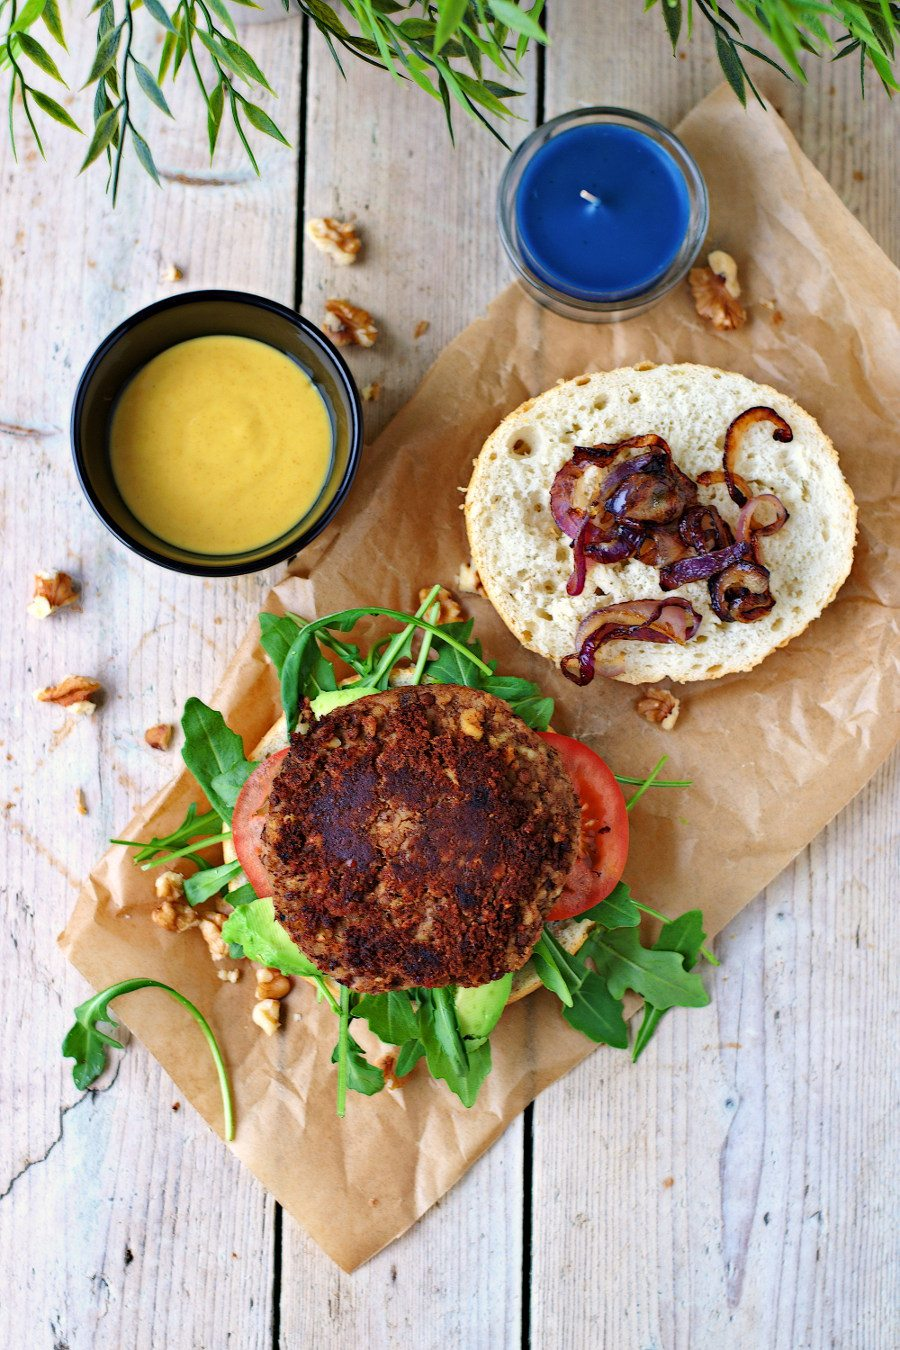 Top view on the open Vegan Lentil Burger placed on parchment paper.